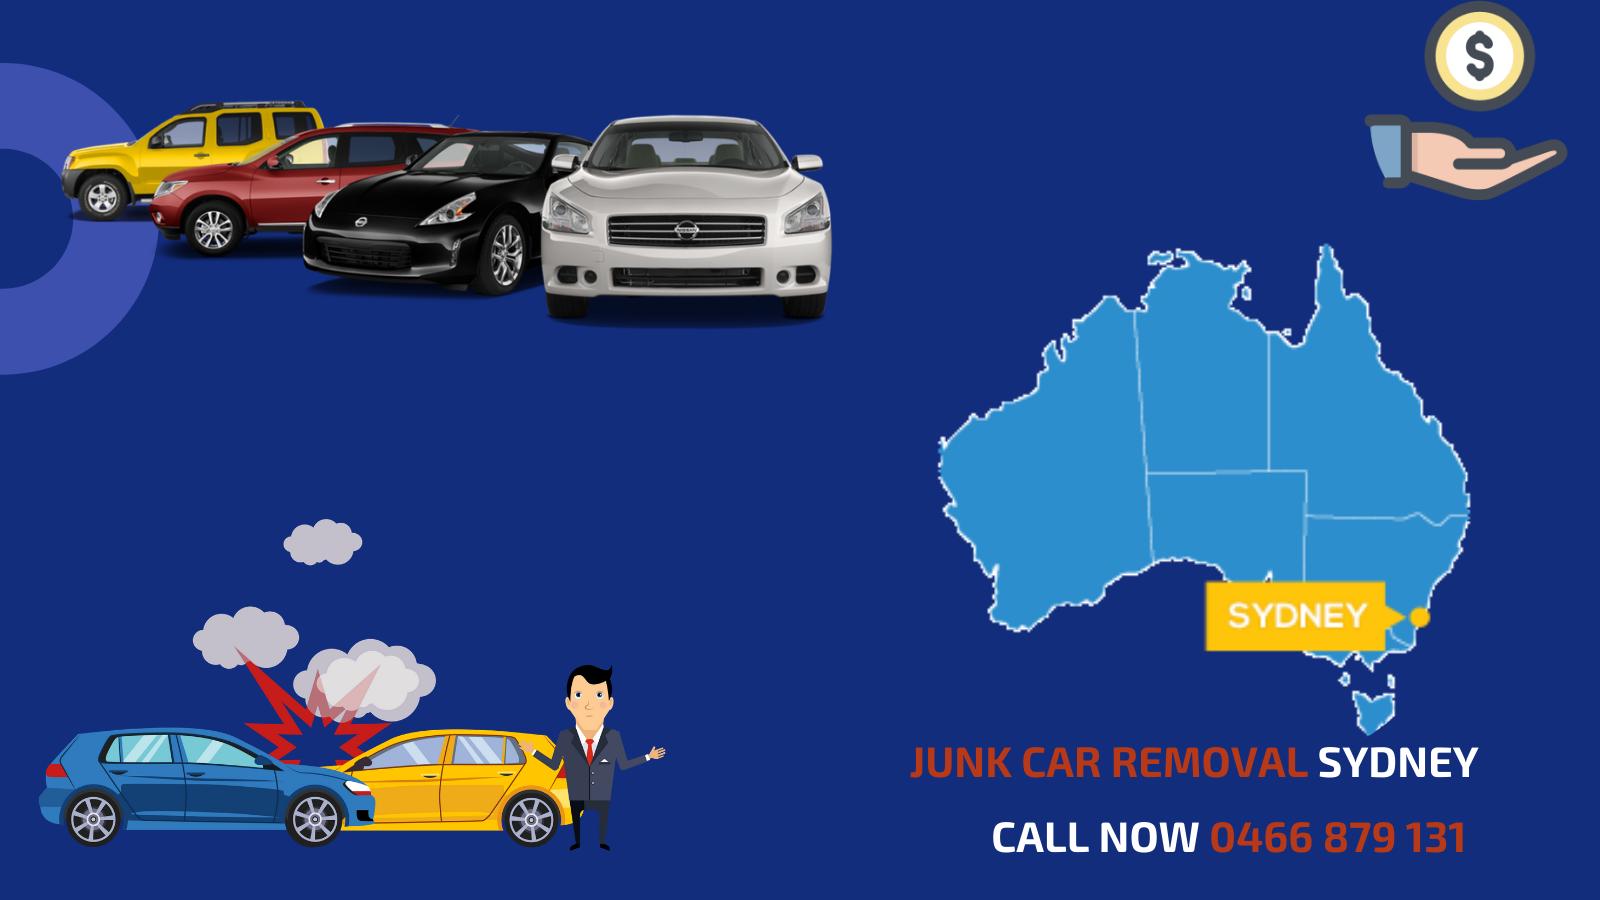 junk car removal sydney